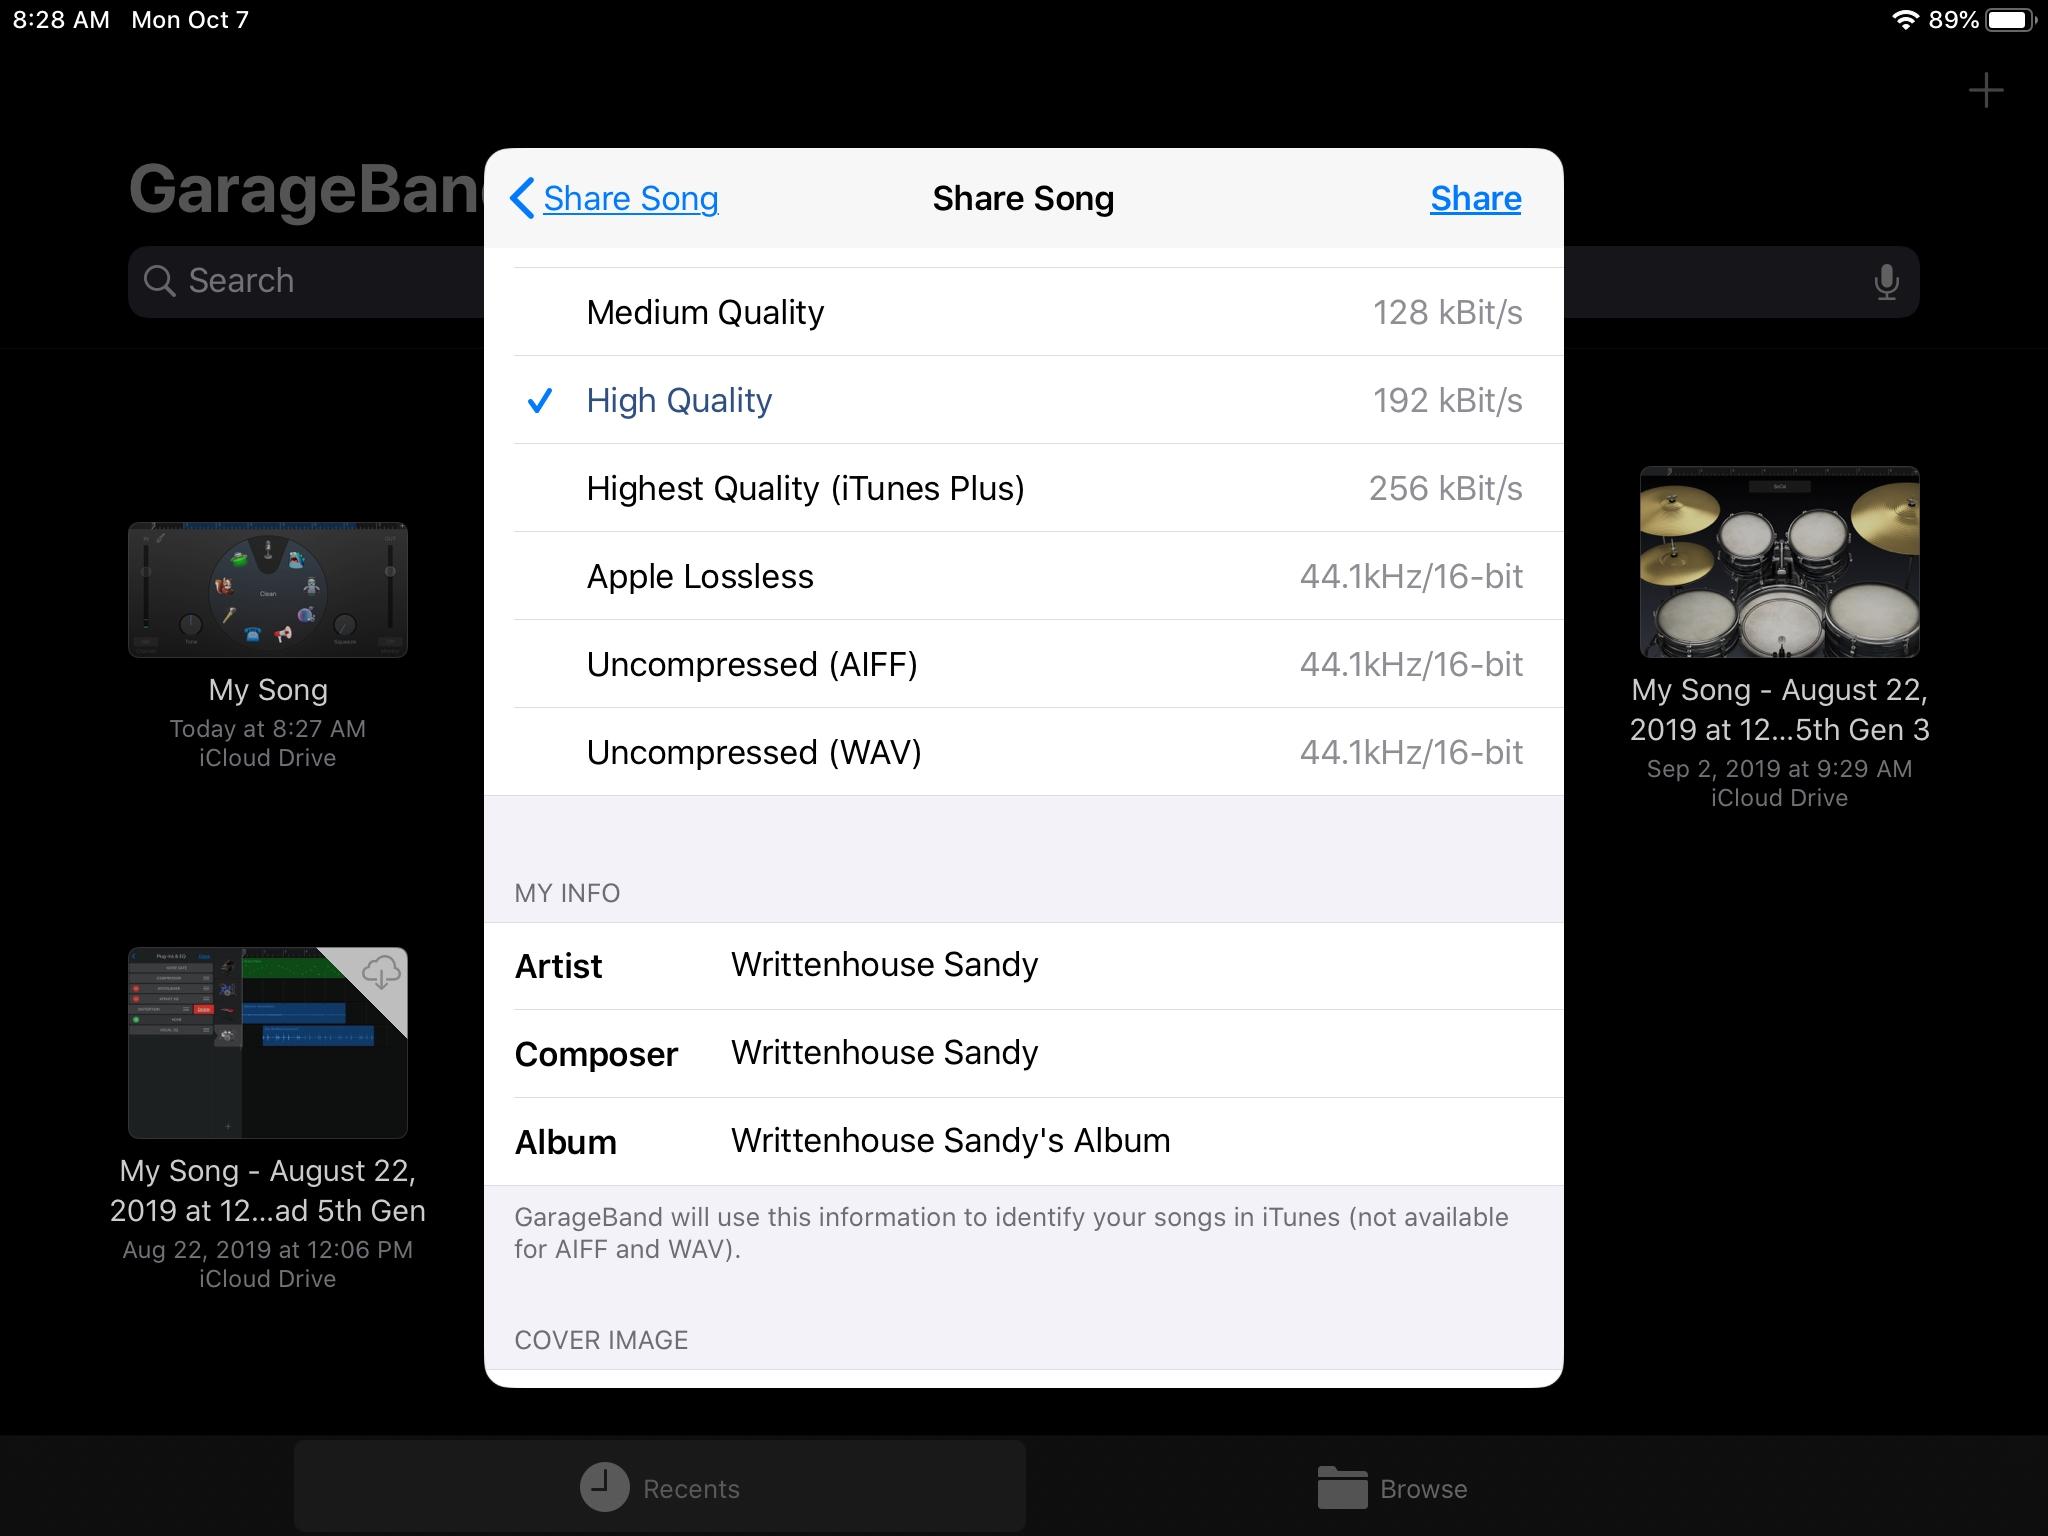 GarageBand Share Song iPad